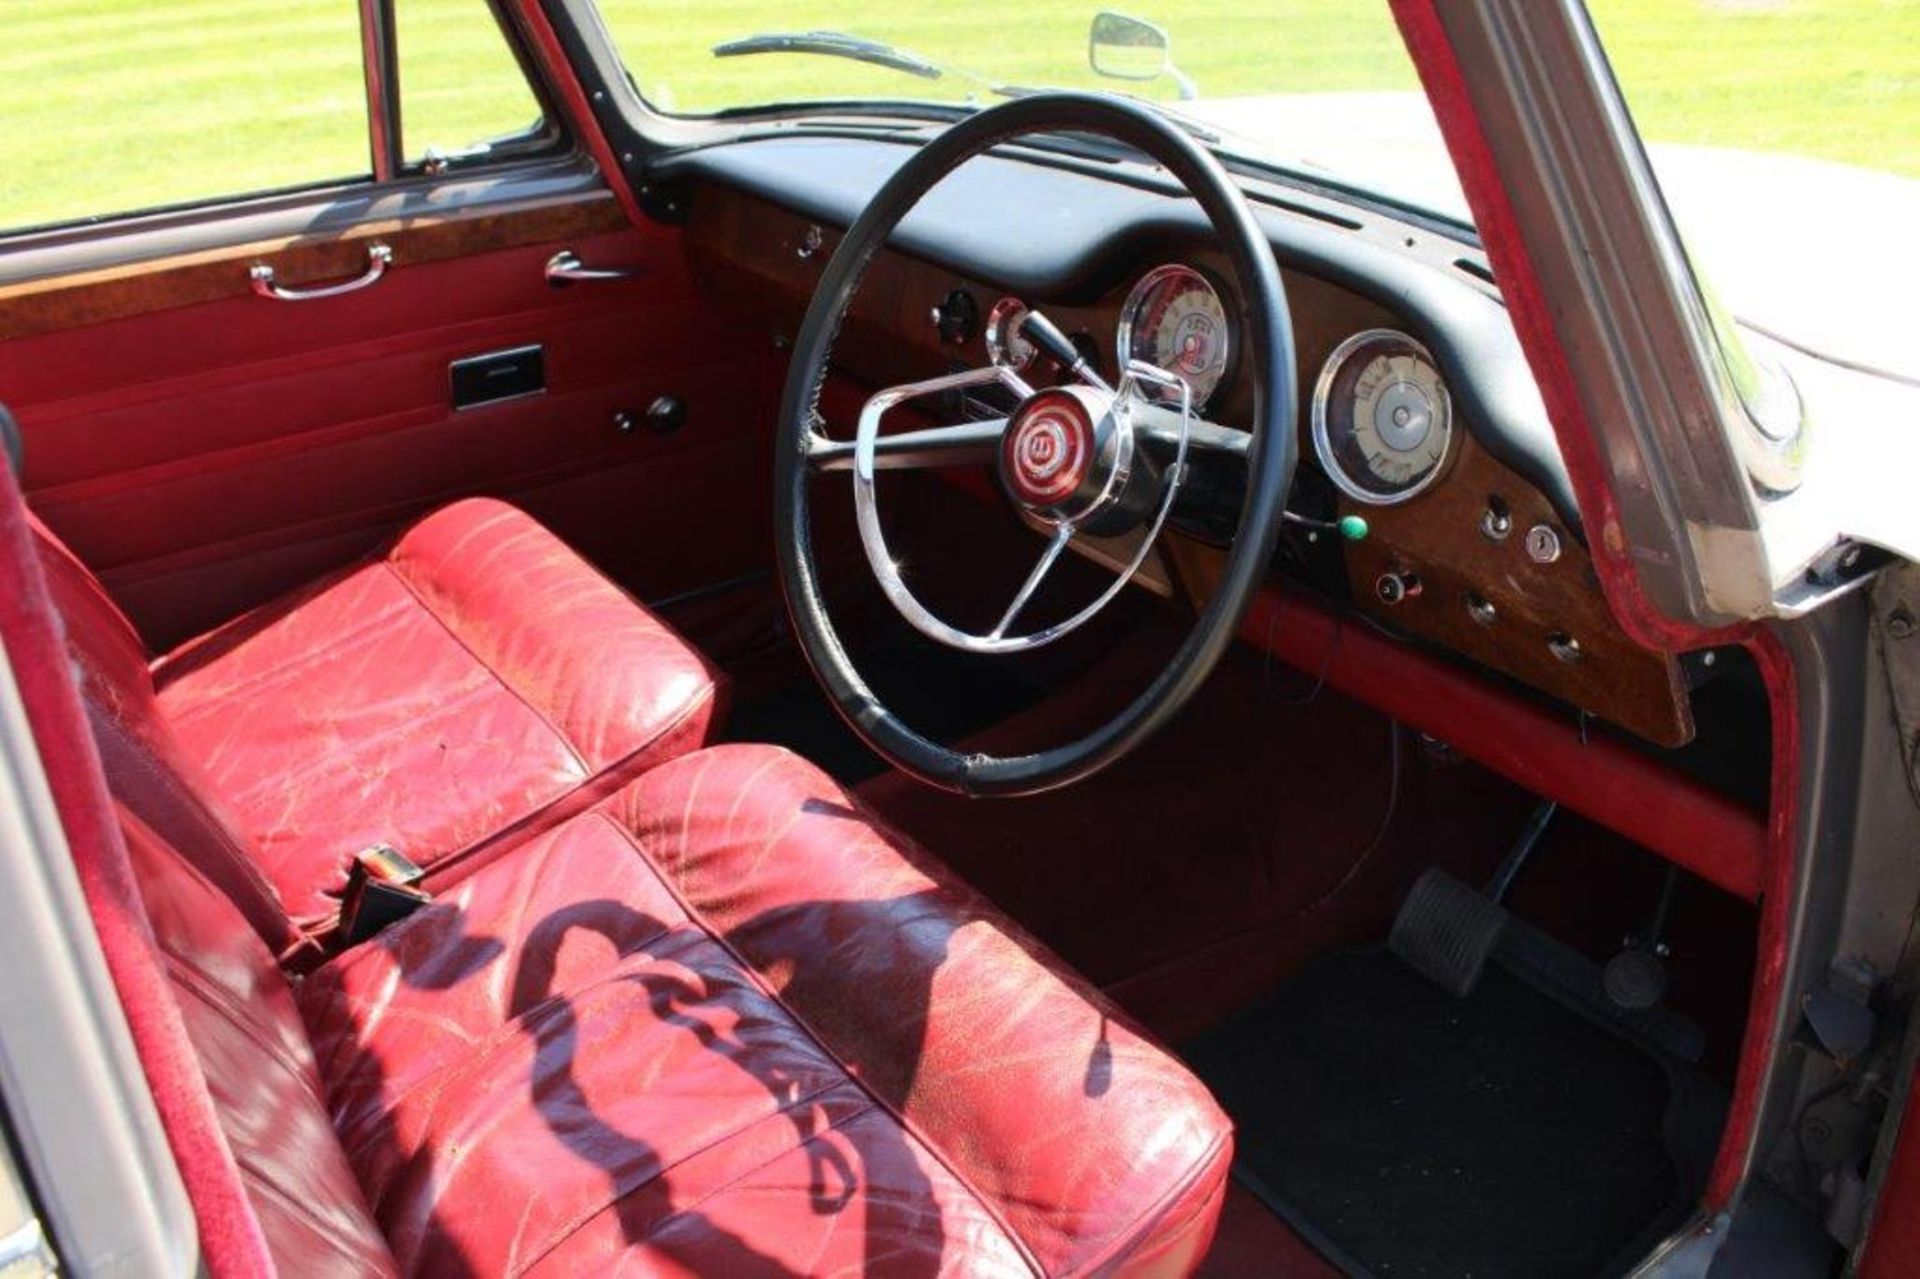 1969 Wolseley 16/60 Auto - Image 18 of 31